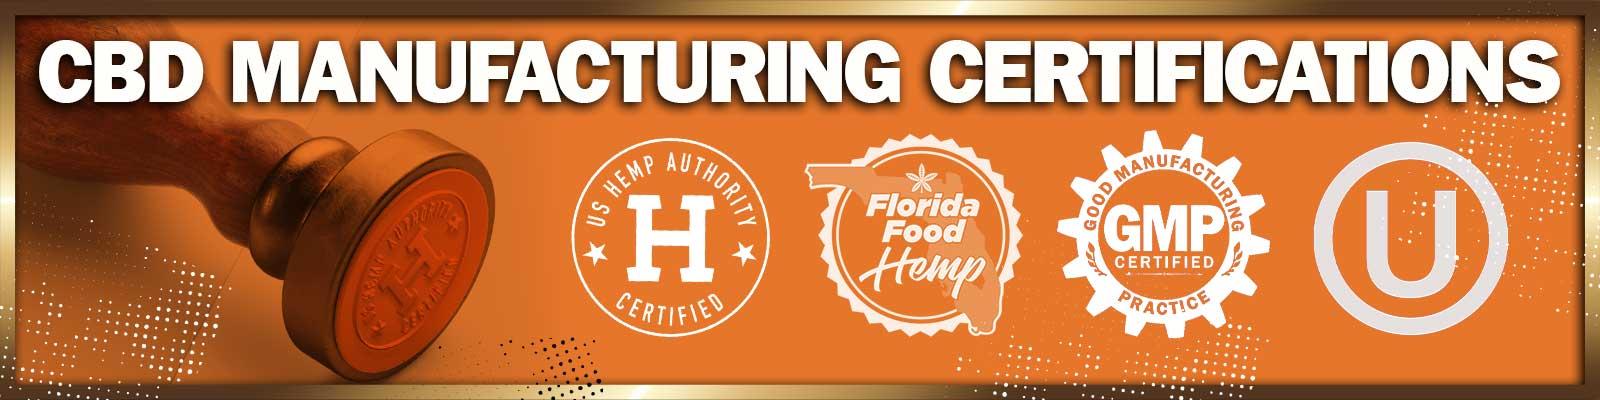 CBD Manufacturing Certifications